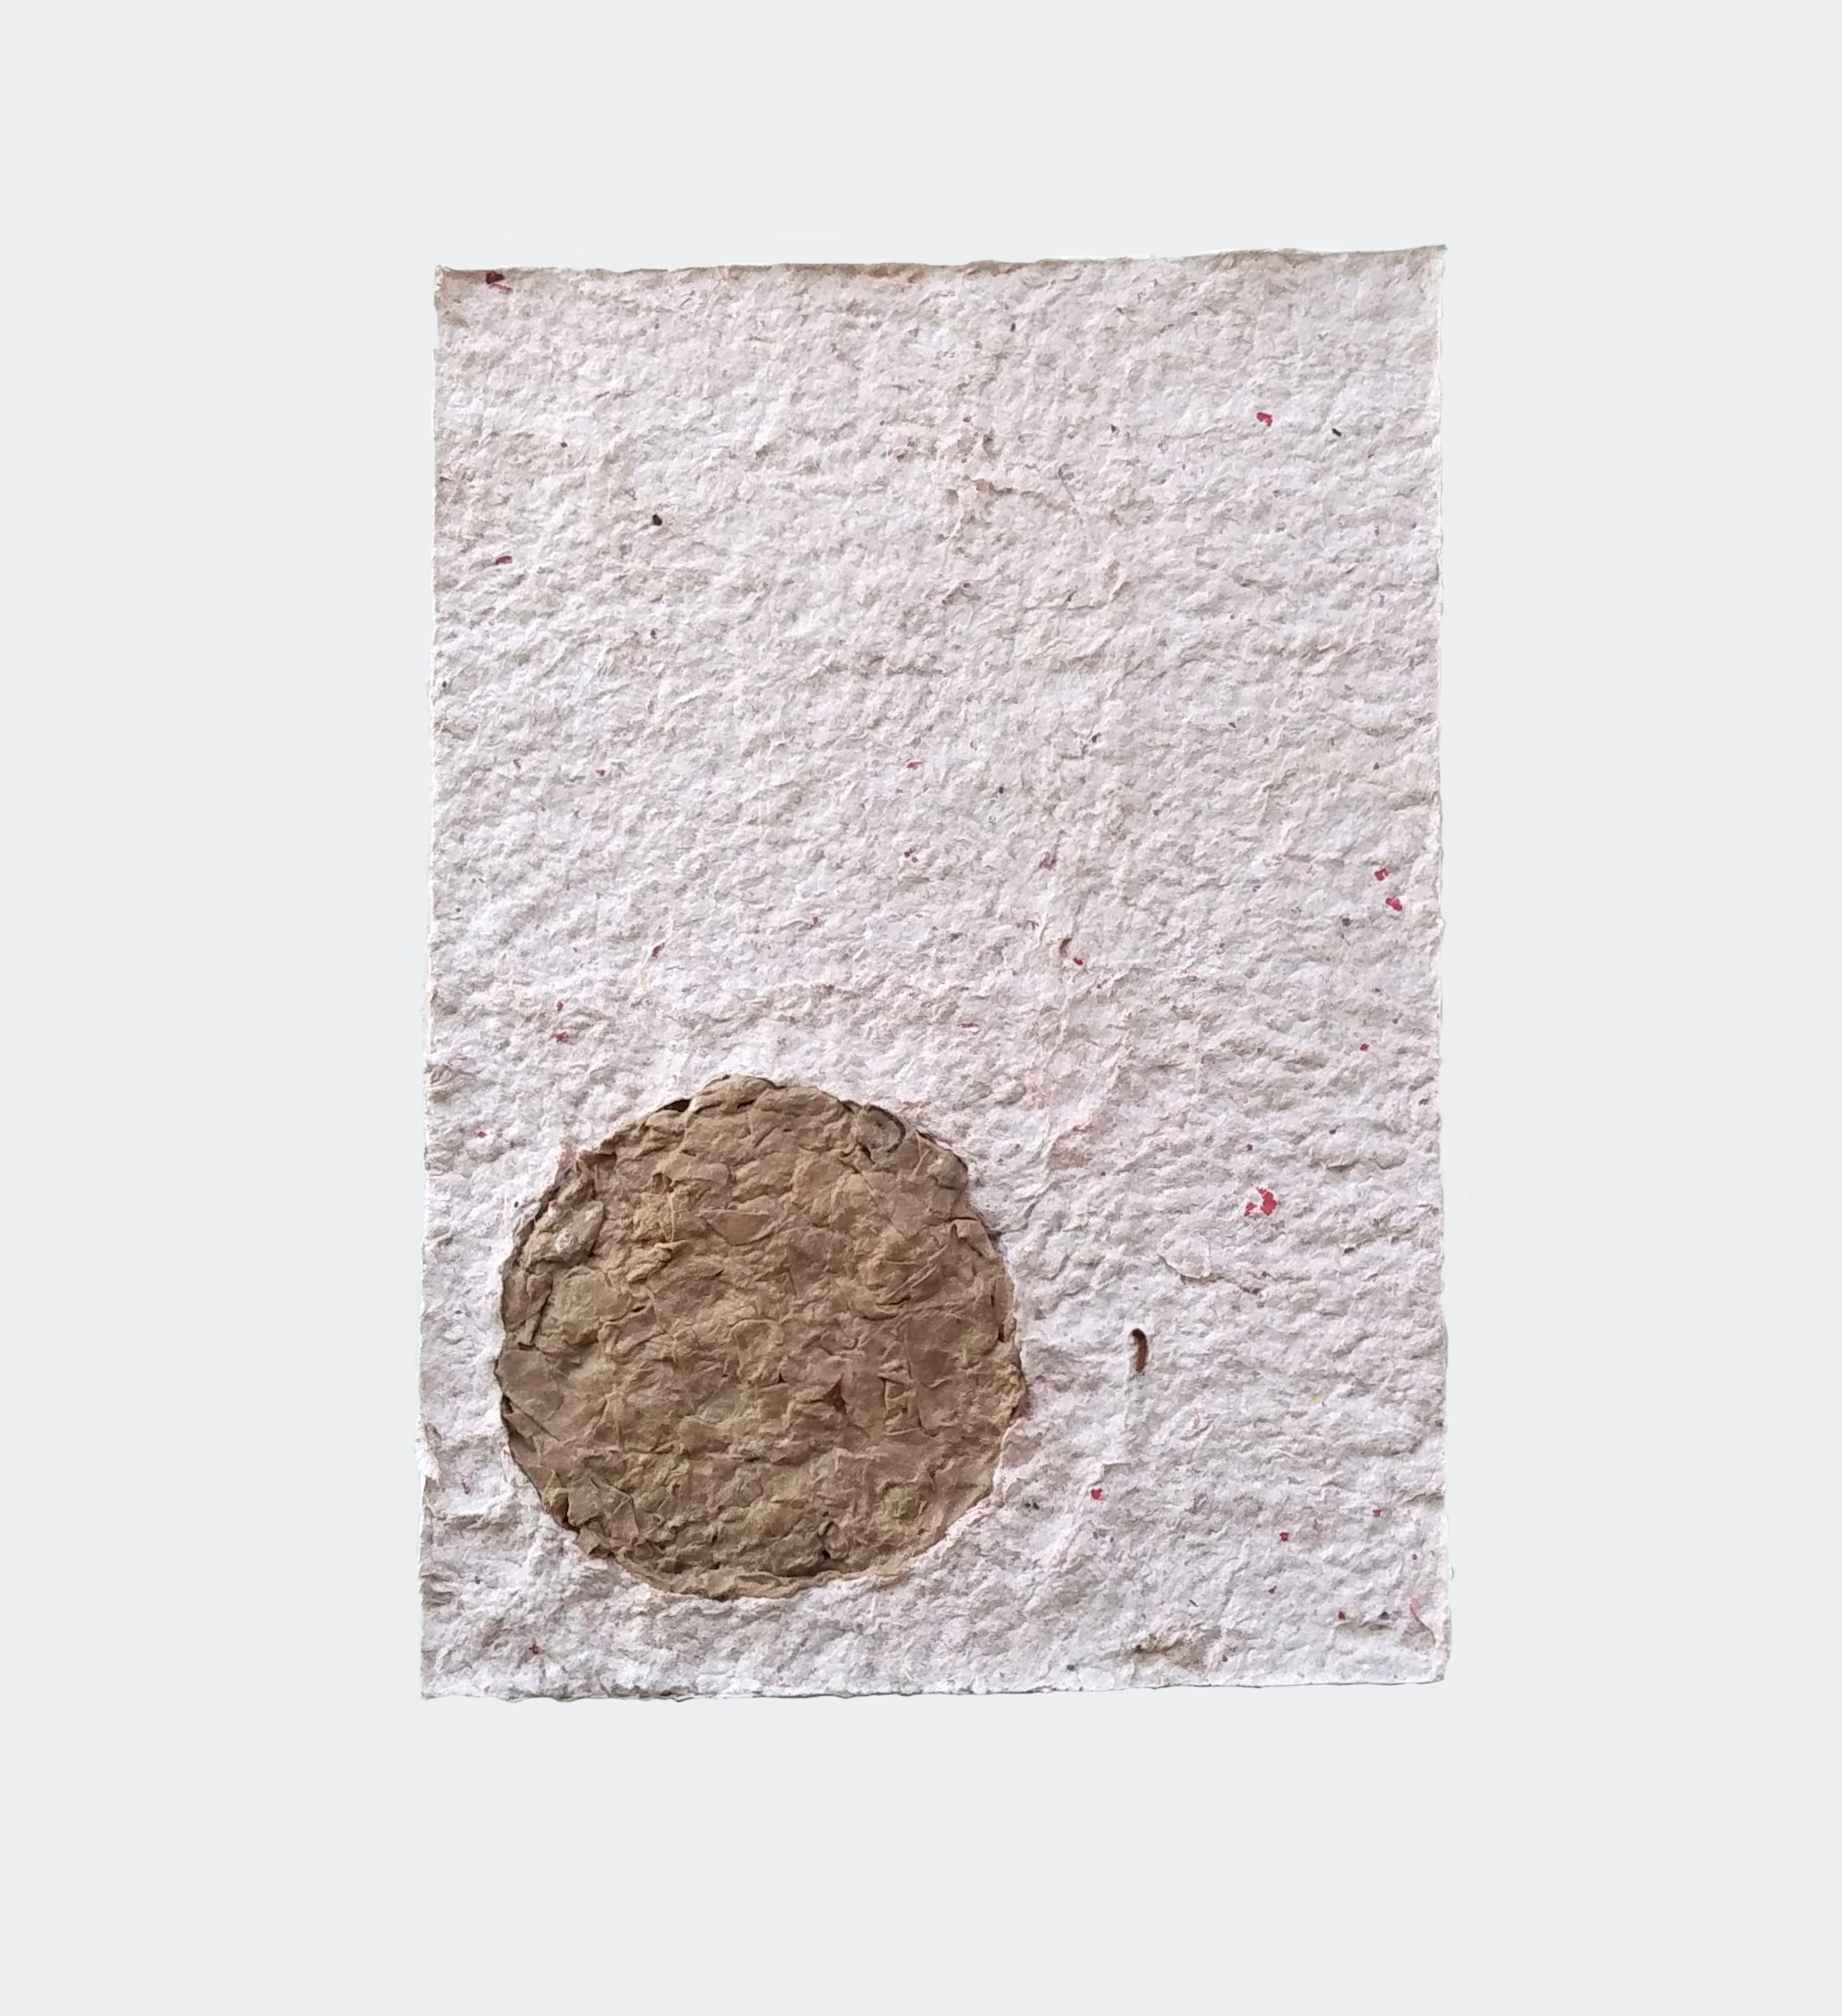 Paul Handley  / Southern Hemisphere, 2019 / McDonald's fries packaging and brown bag / 21 cm x 30 cm